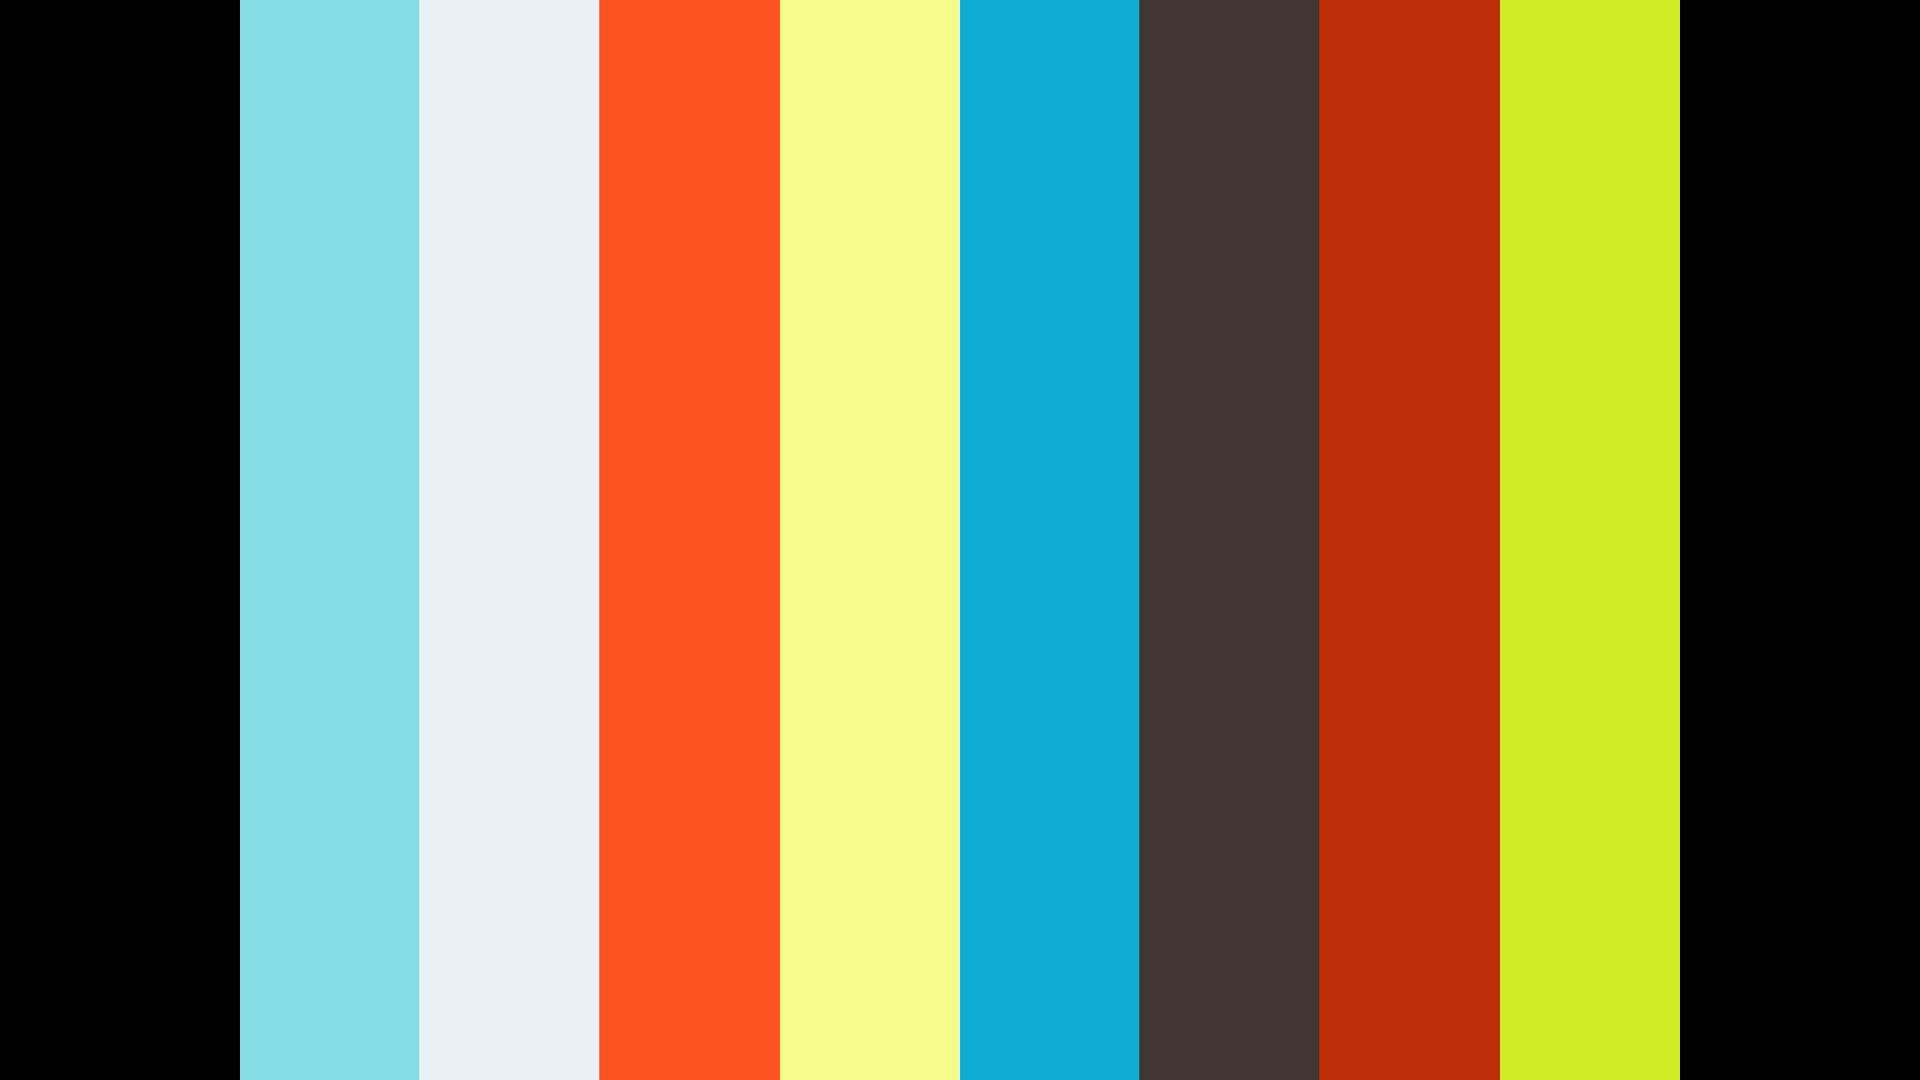 SHANA - ABSOLUTE 45 (19 August 2021)